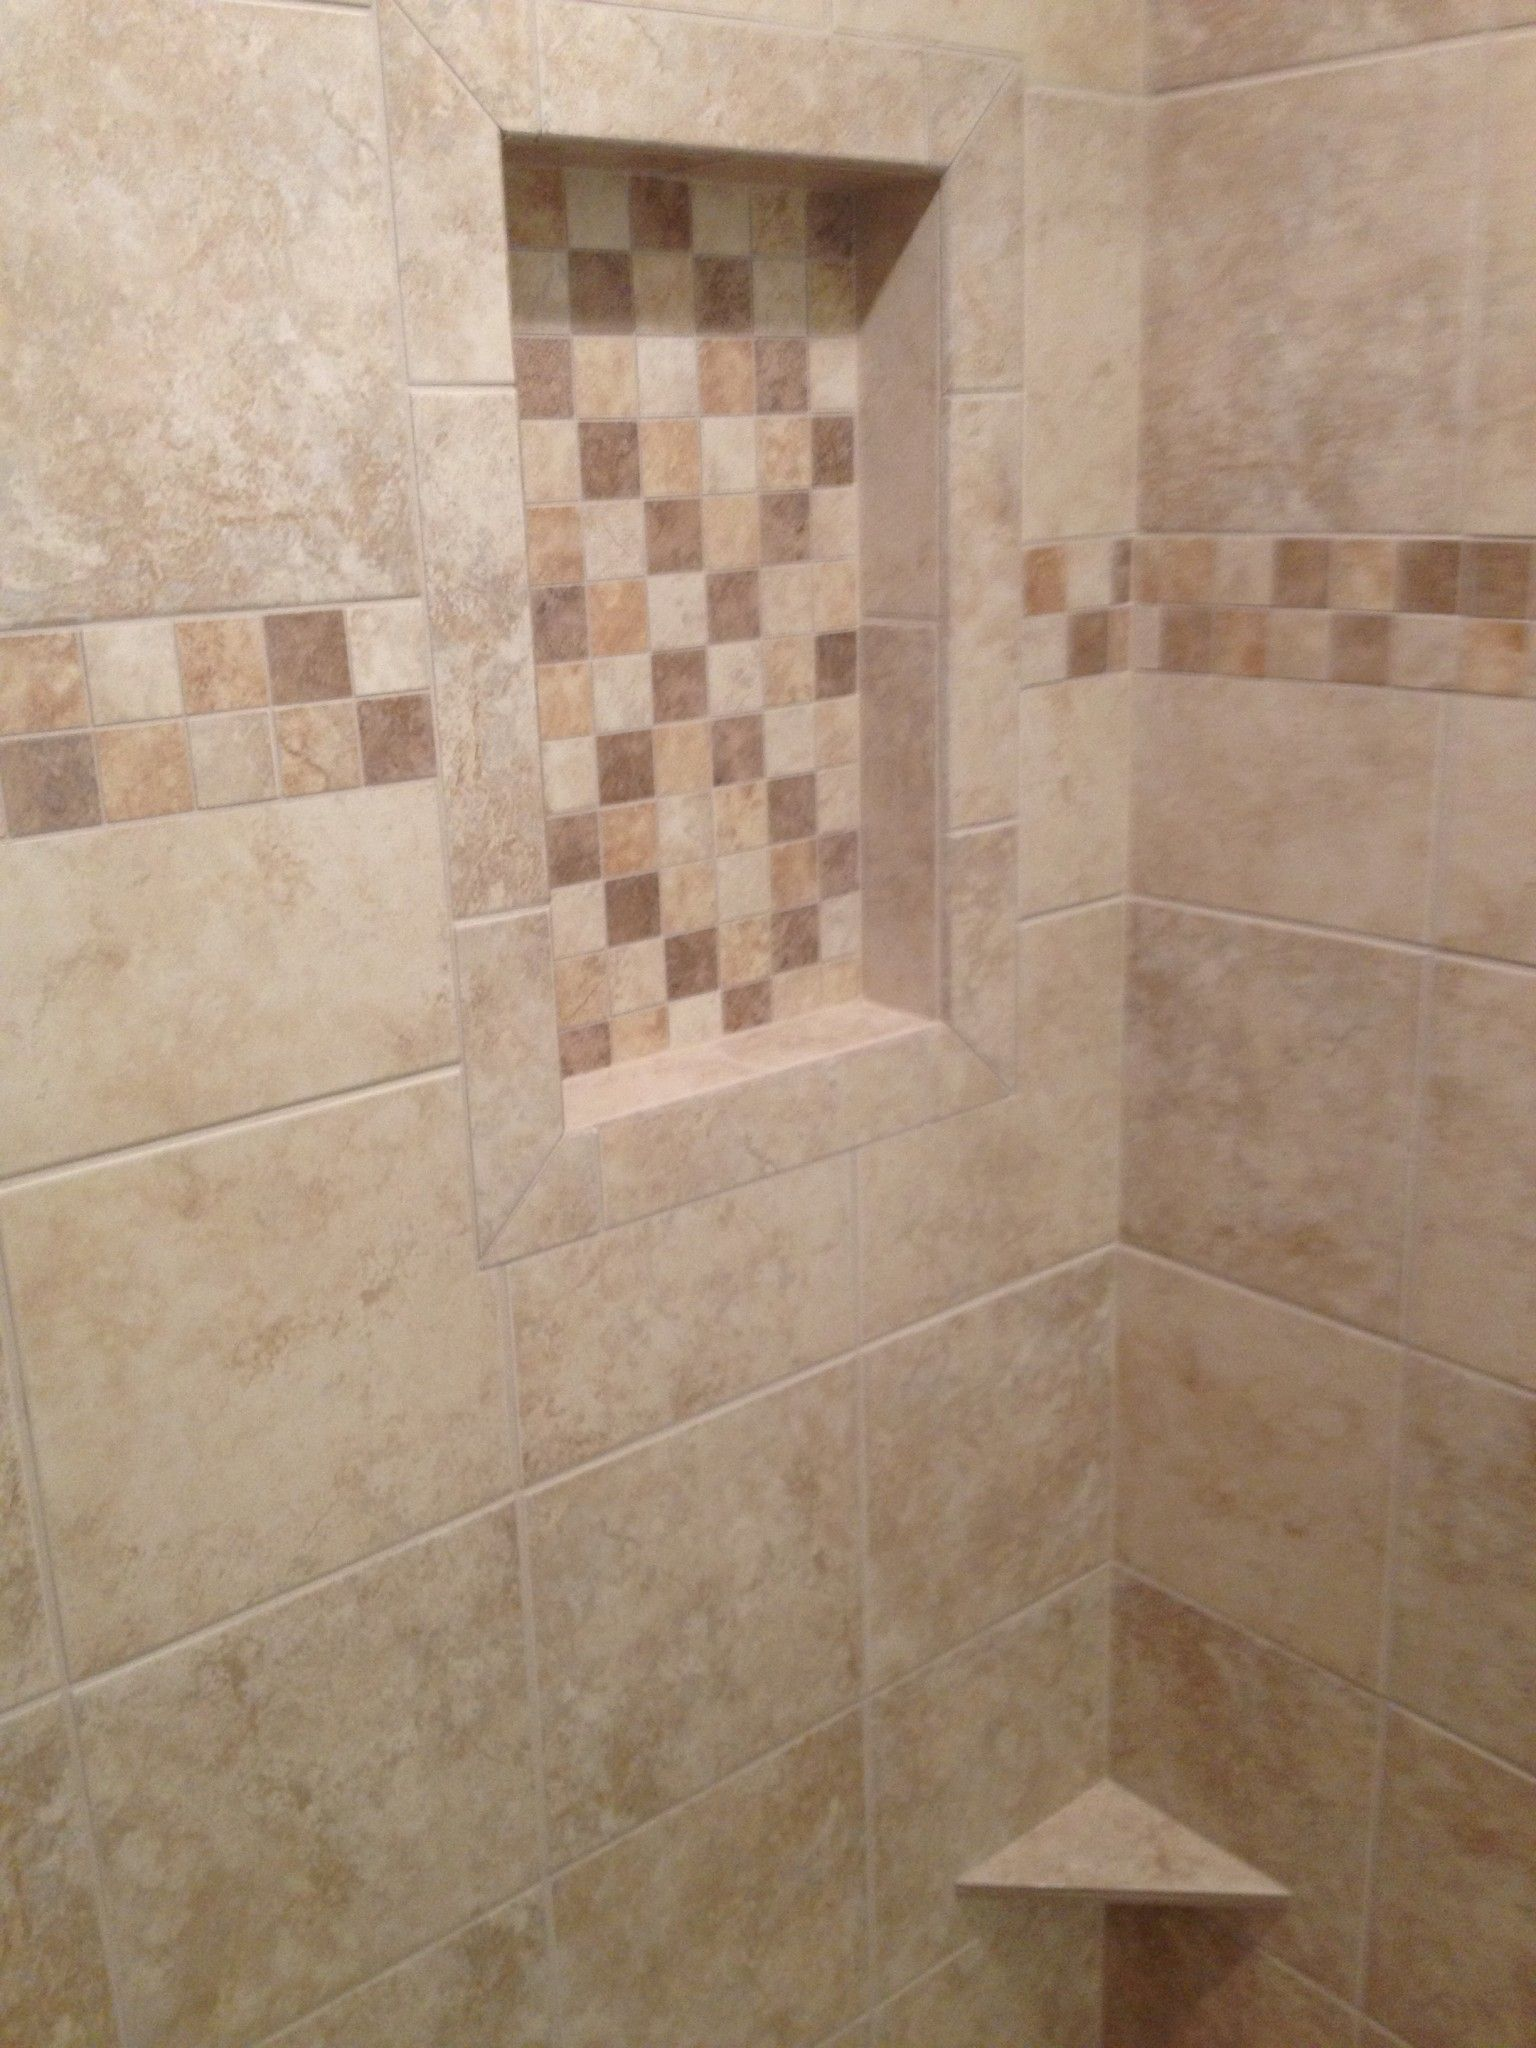 Bathroom Fixtures Greensboro Nc  Bathroom Design 20172018 Magnificent Bathroom Remodeling Greensboro Nc Decorating Inspiration